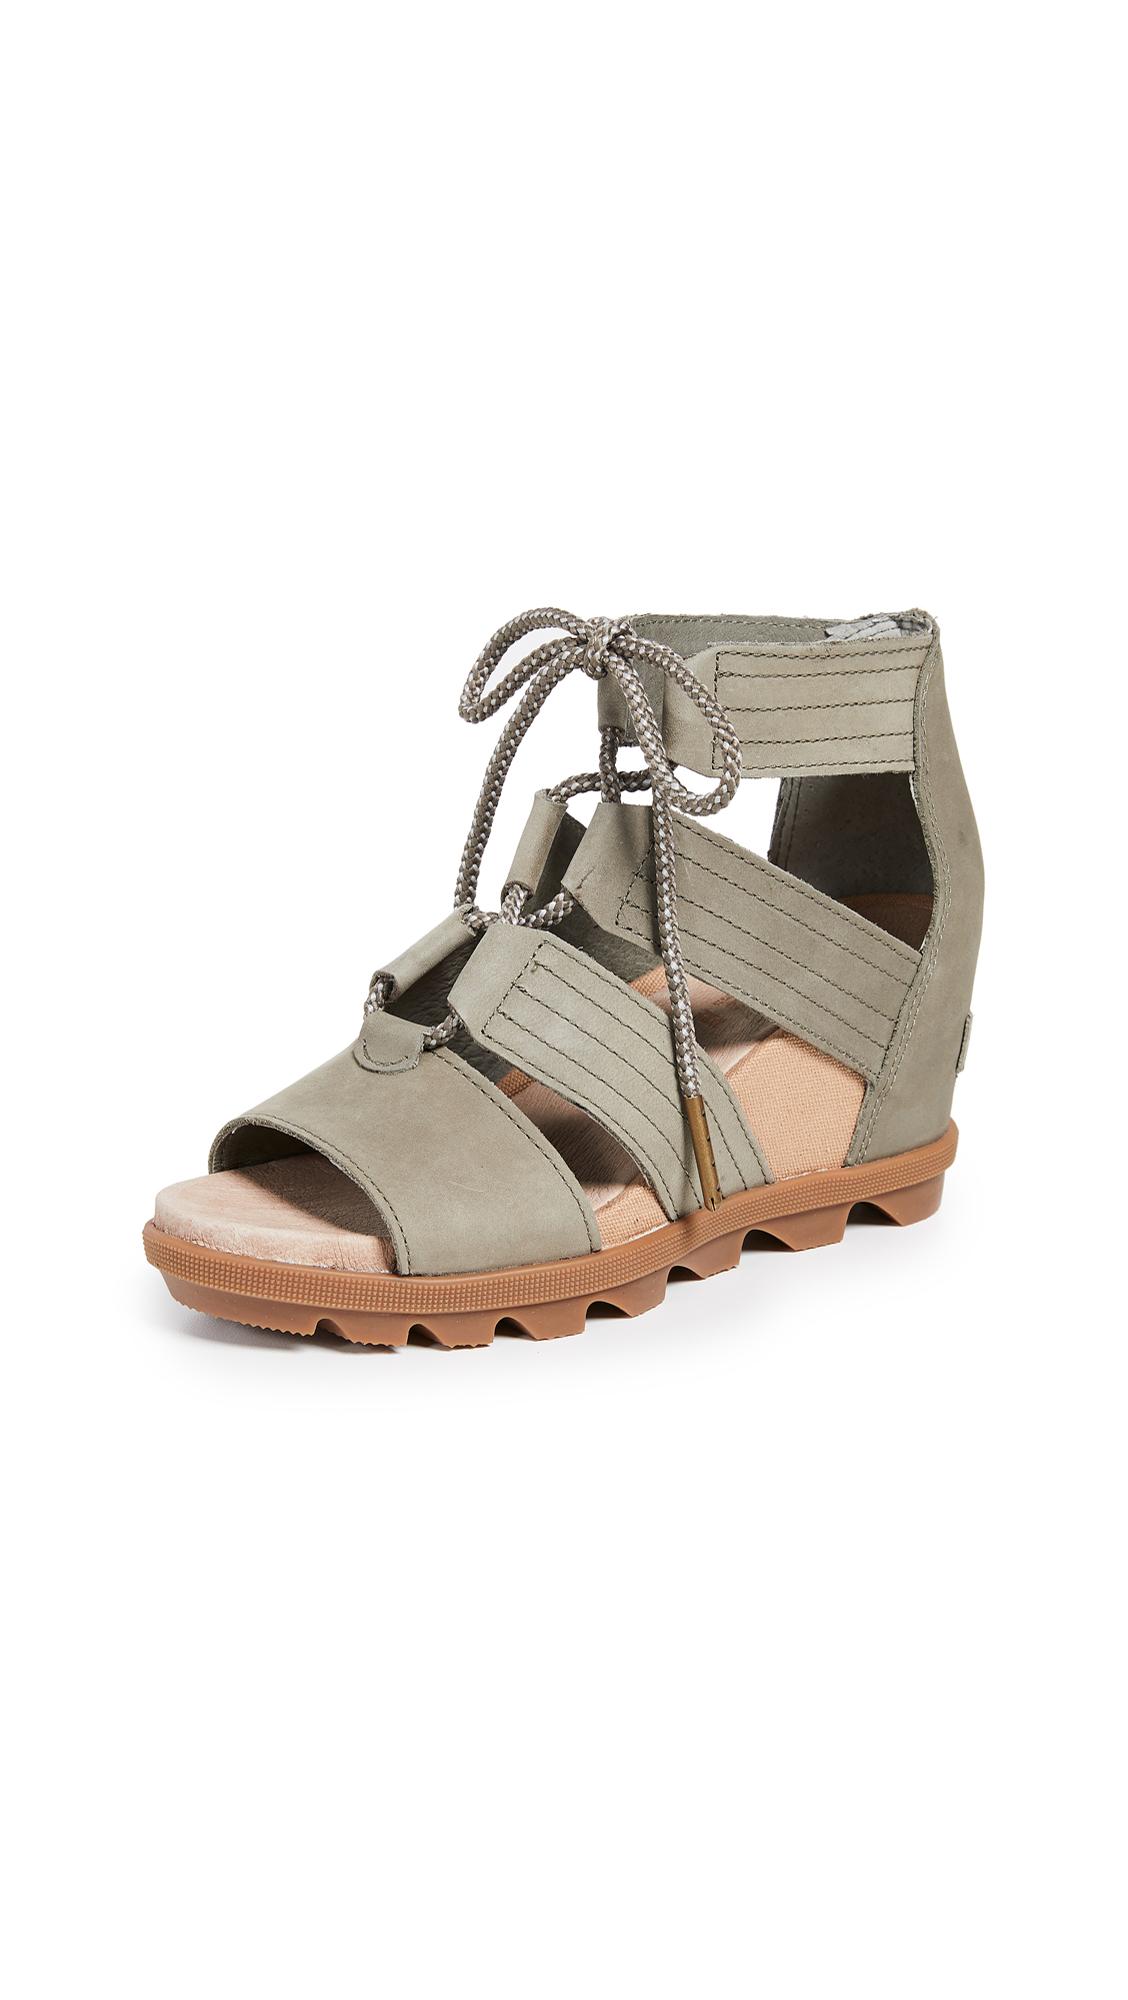 Sorel Joanie II Lace Wedge Sandals - Sage